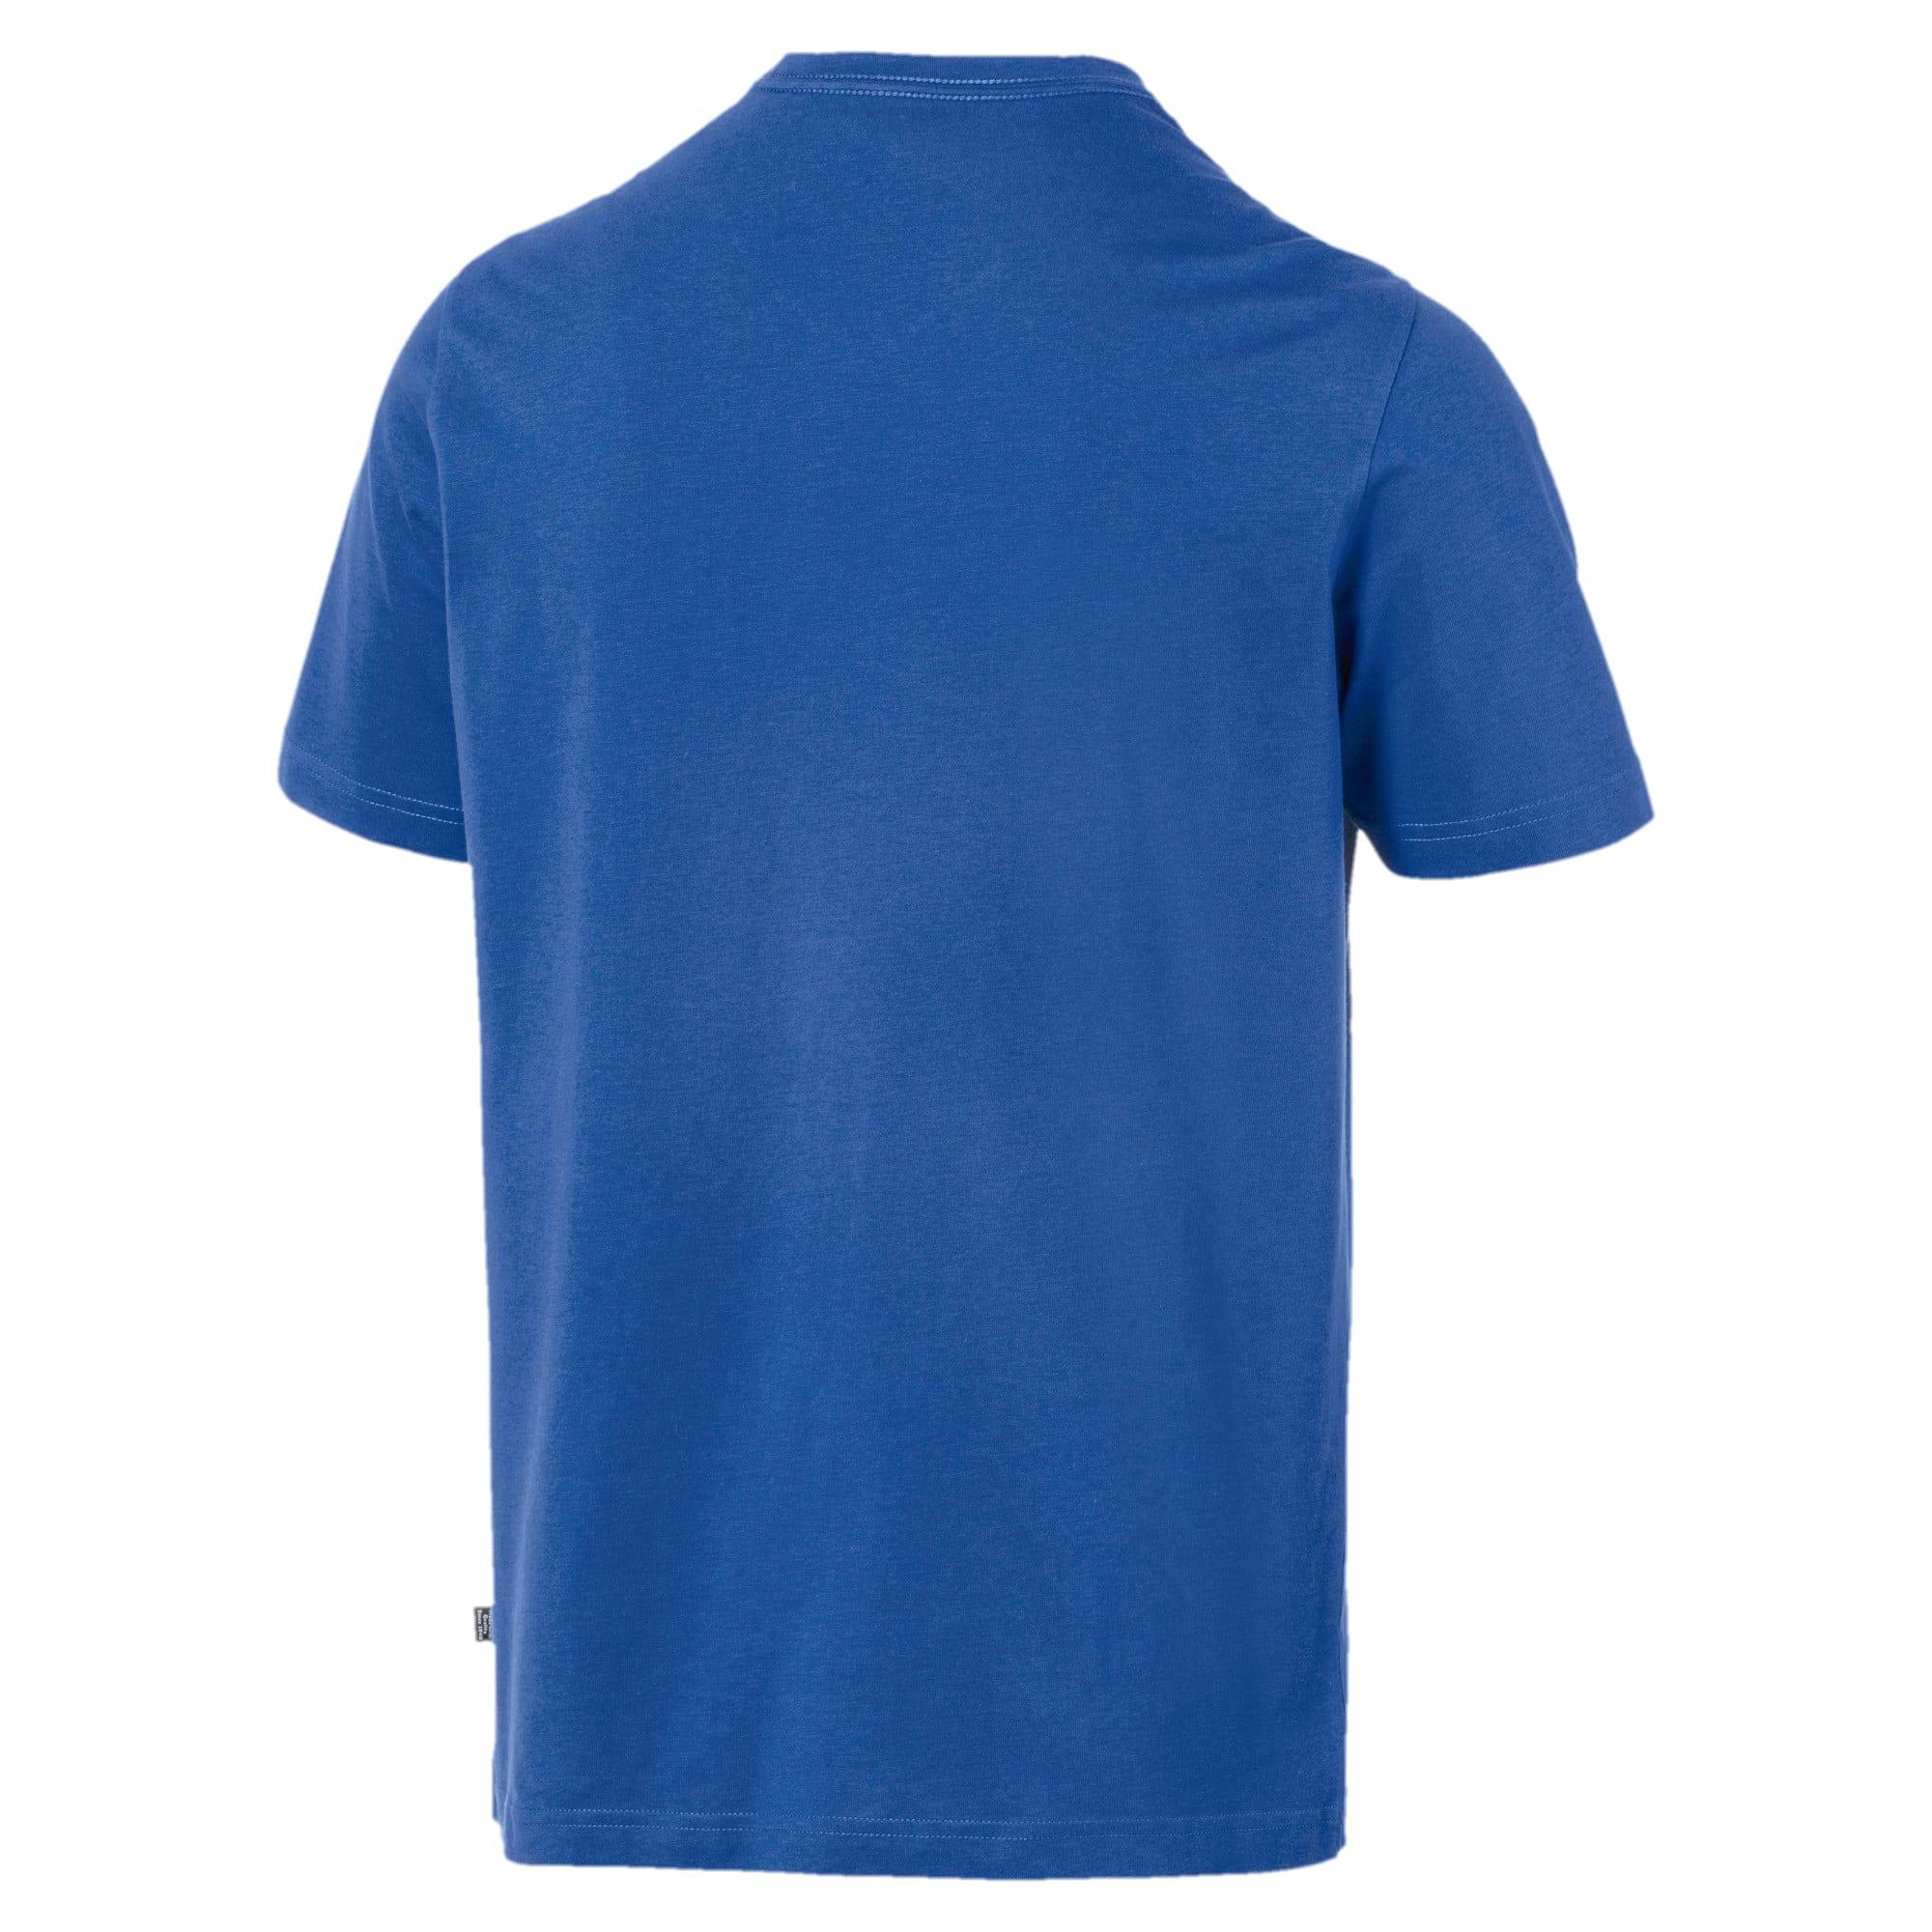 Thumbnail 5 of T-shirt con scollo a V Essentials uomo, Galaxy Blue, medium